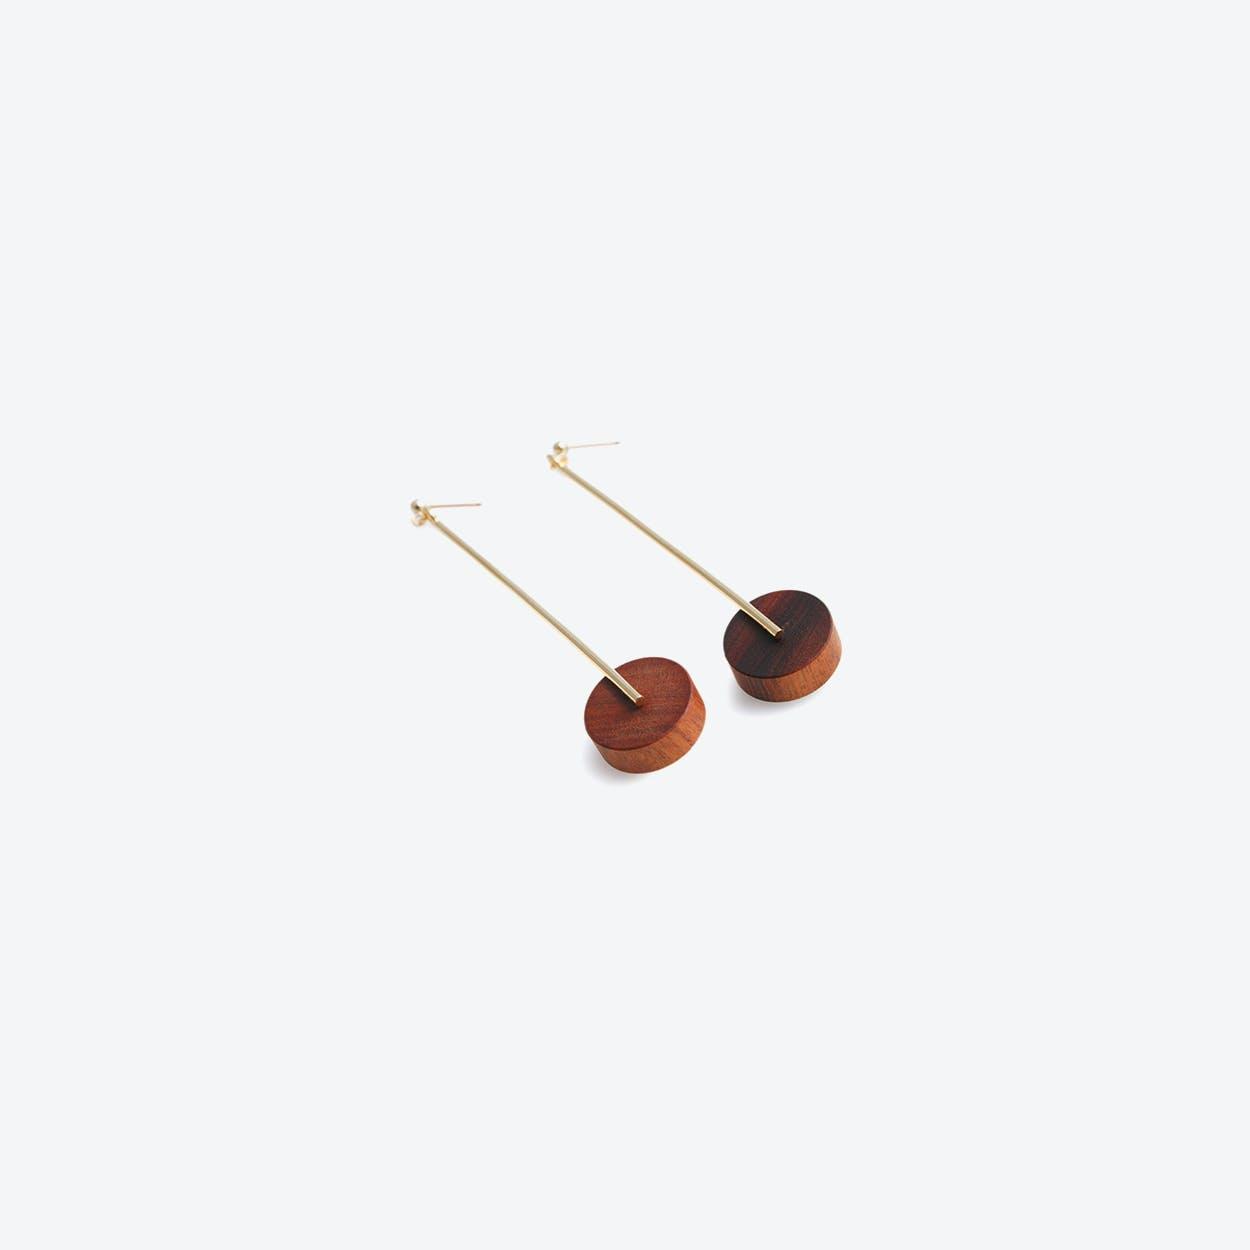 Kasia Large Earrings Gold & Wood